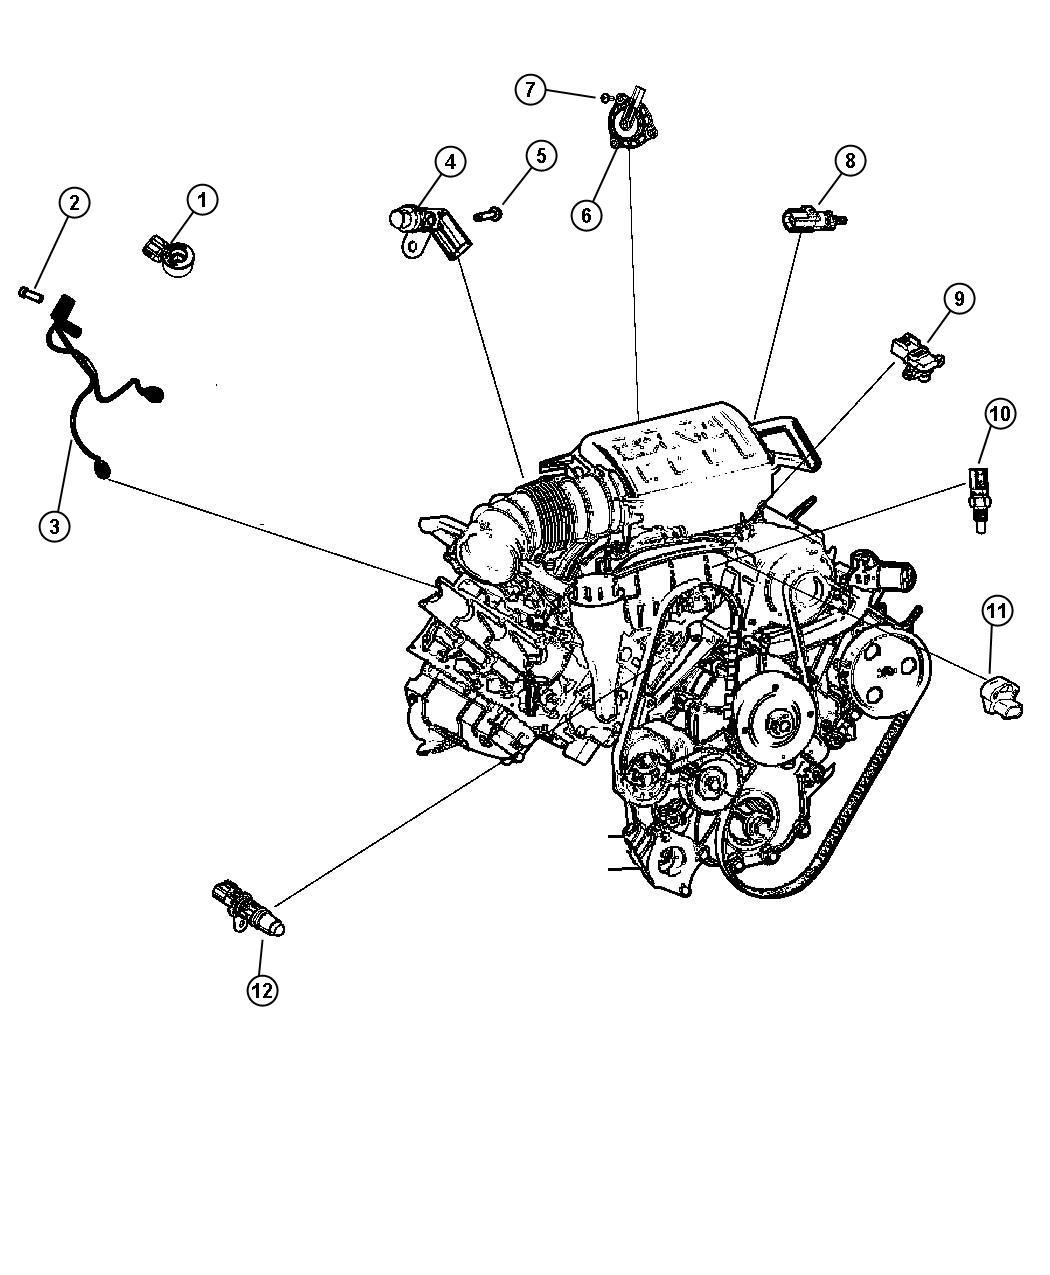 2011 Dodge Journey CREW Sensors Engine.